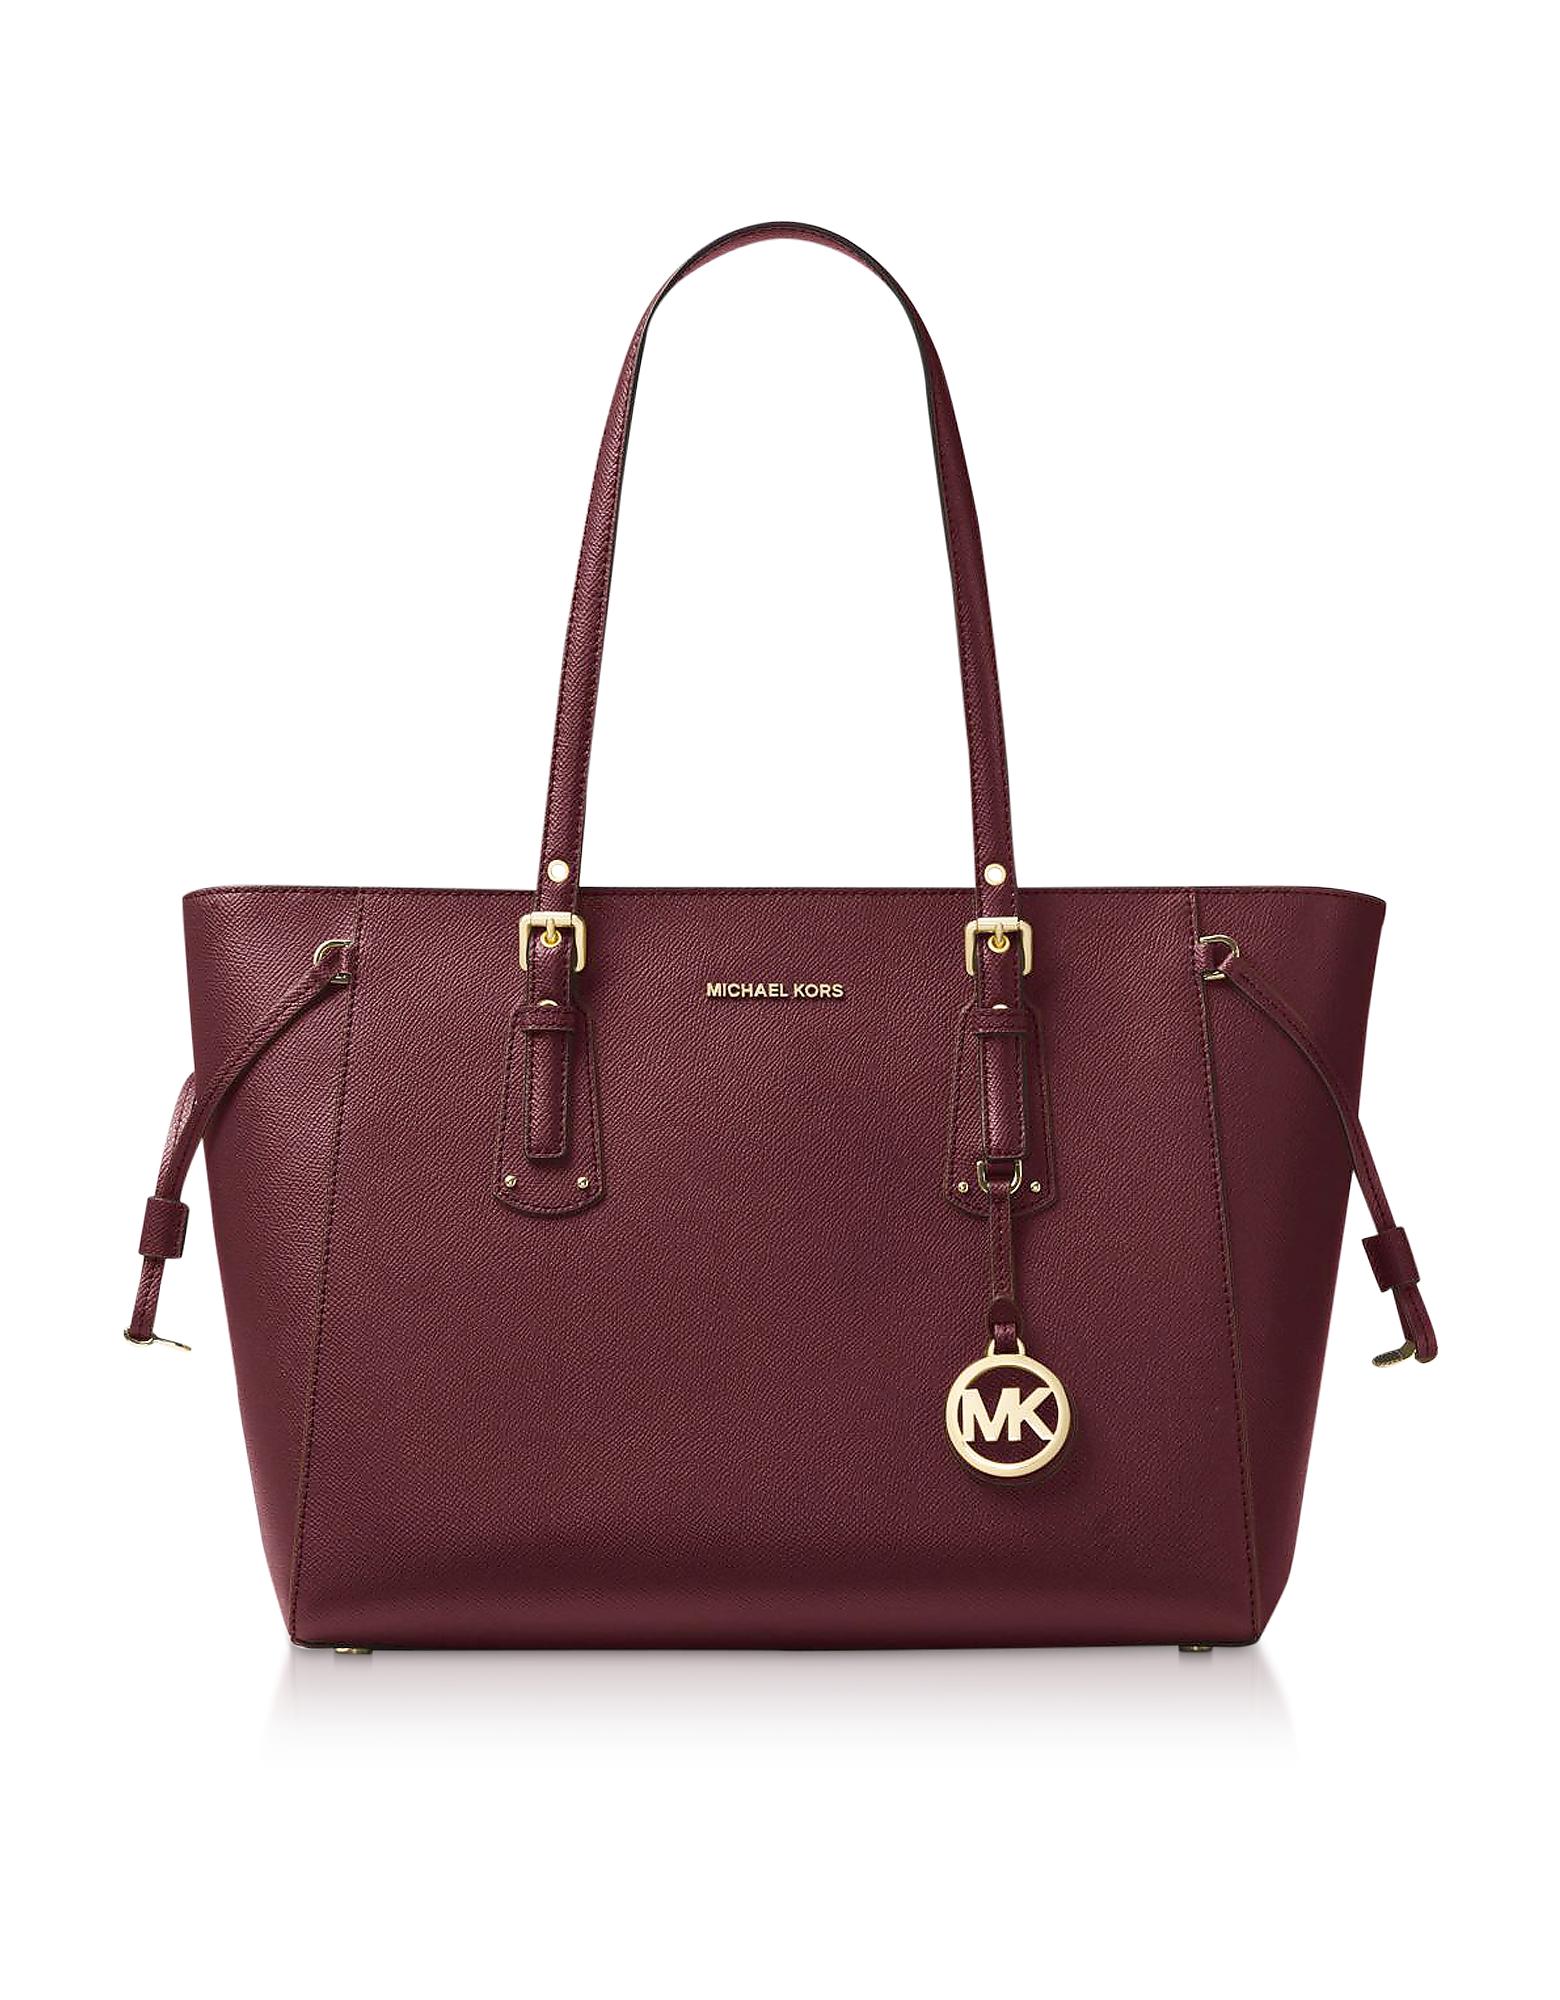 061b1ab952ae Click here for Michael Kors Designer Handbags Voyager Medium Top... prices